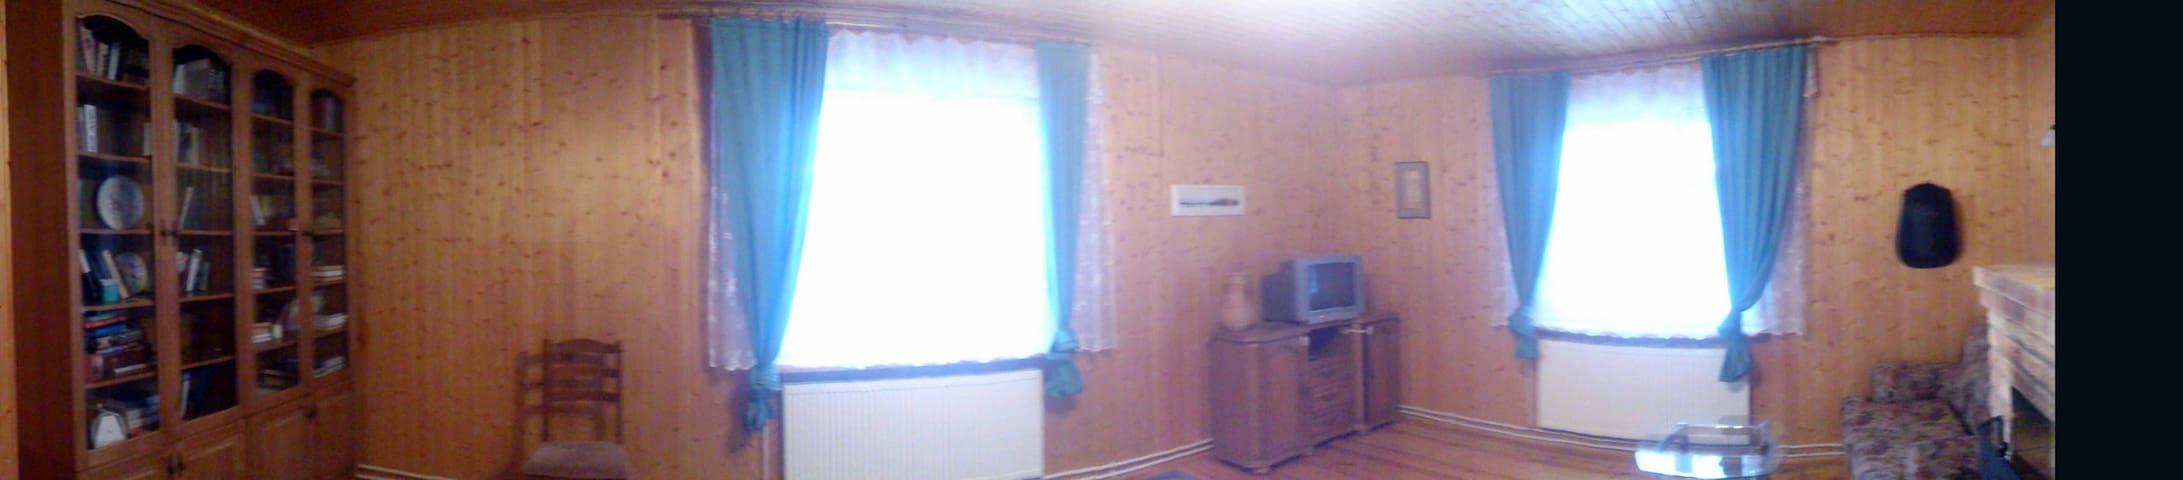 Дом в тихом месте - Klopovo - Dům